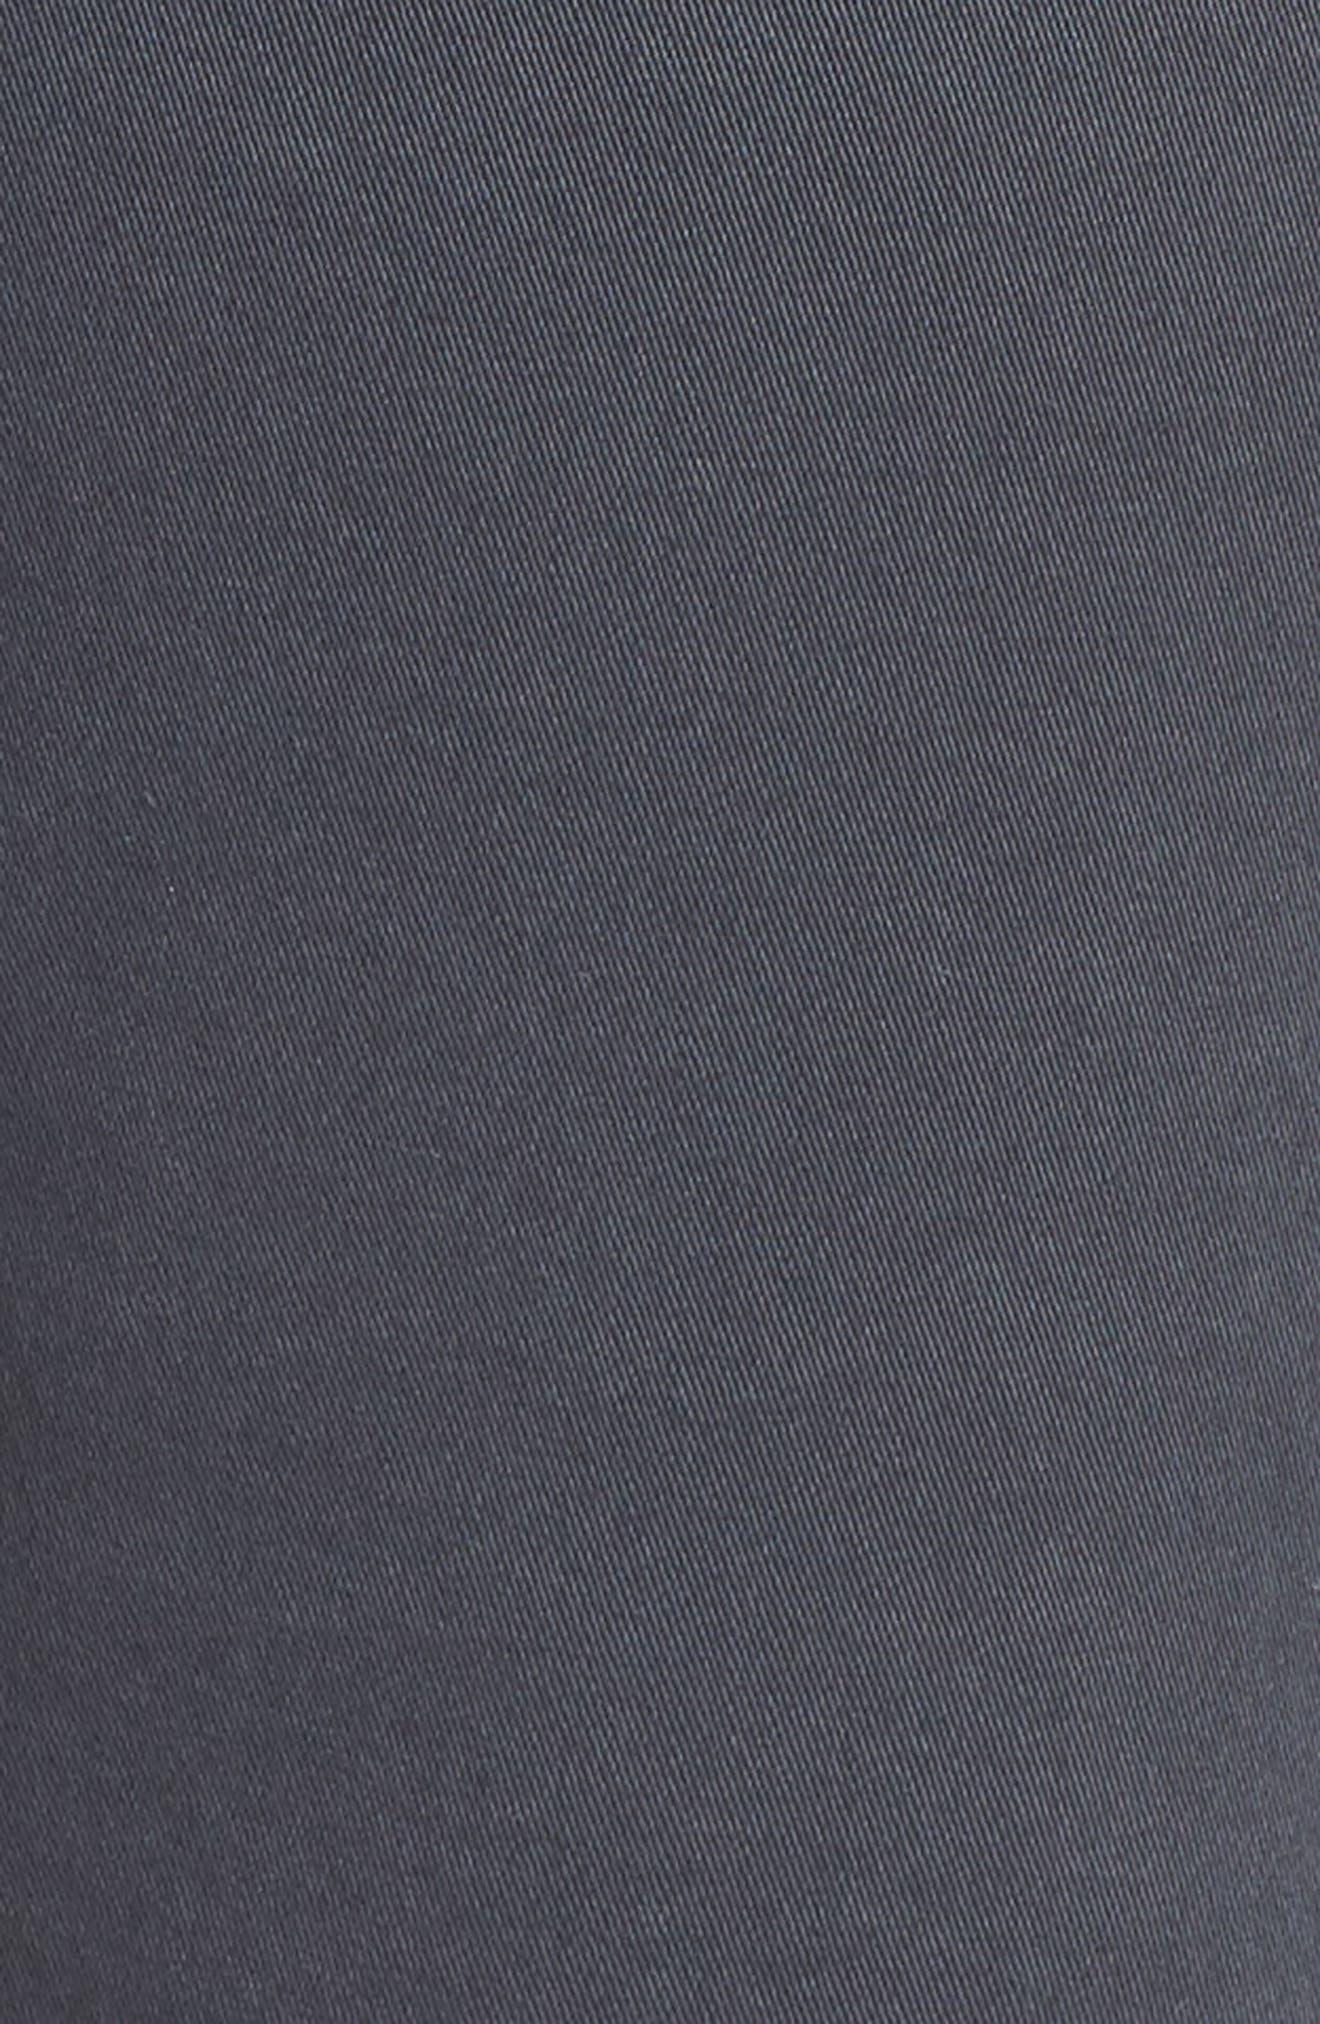 Twill Shorts,                             Alternate thumbnail 6, color,                             030